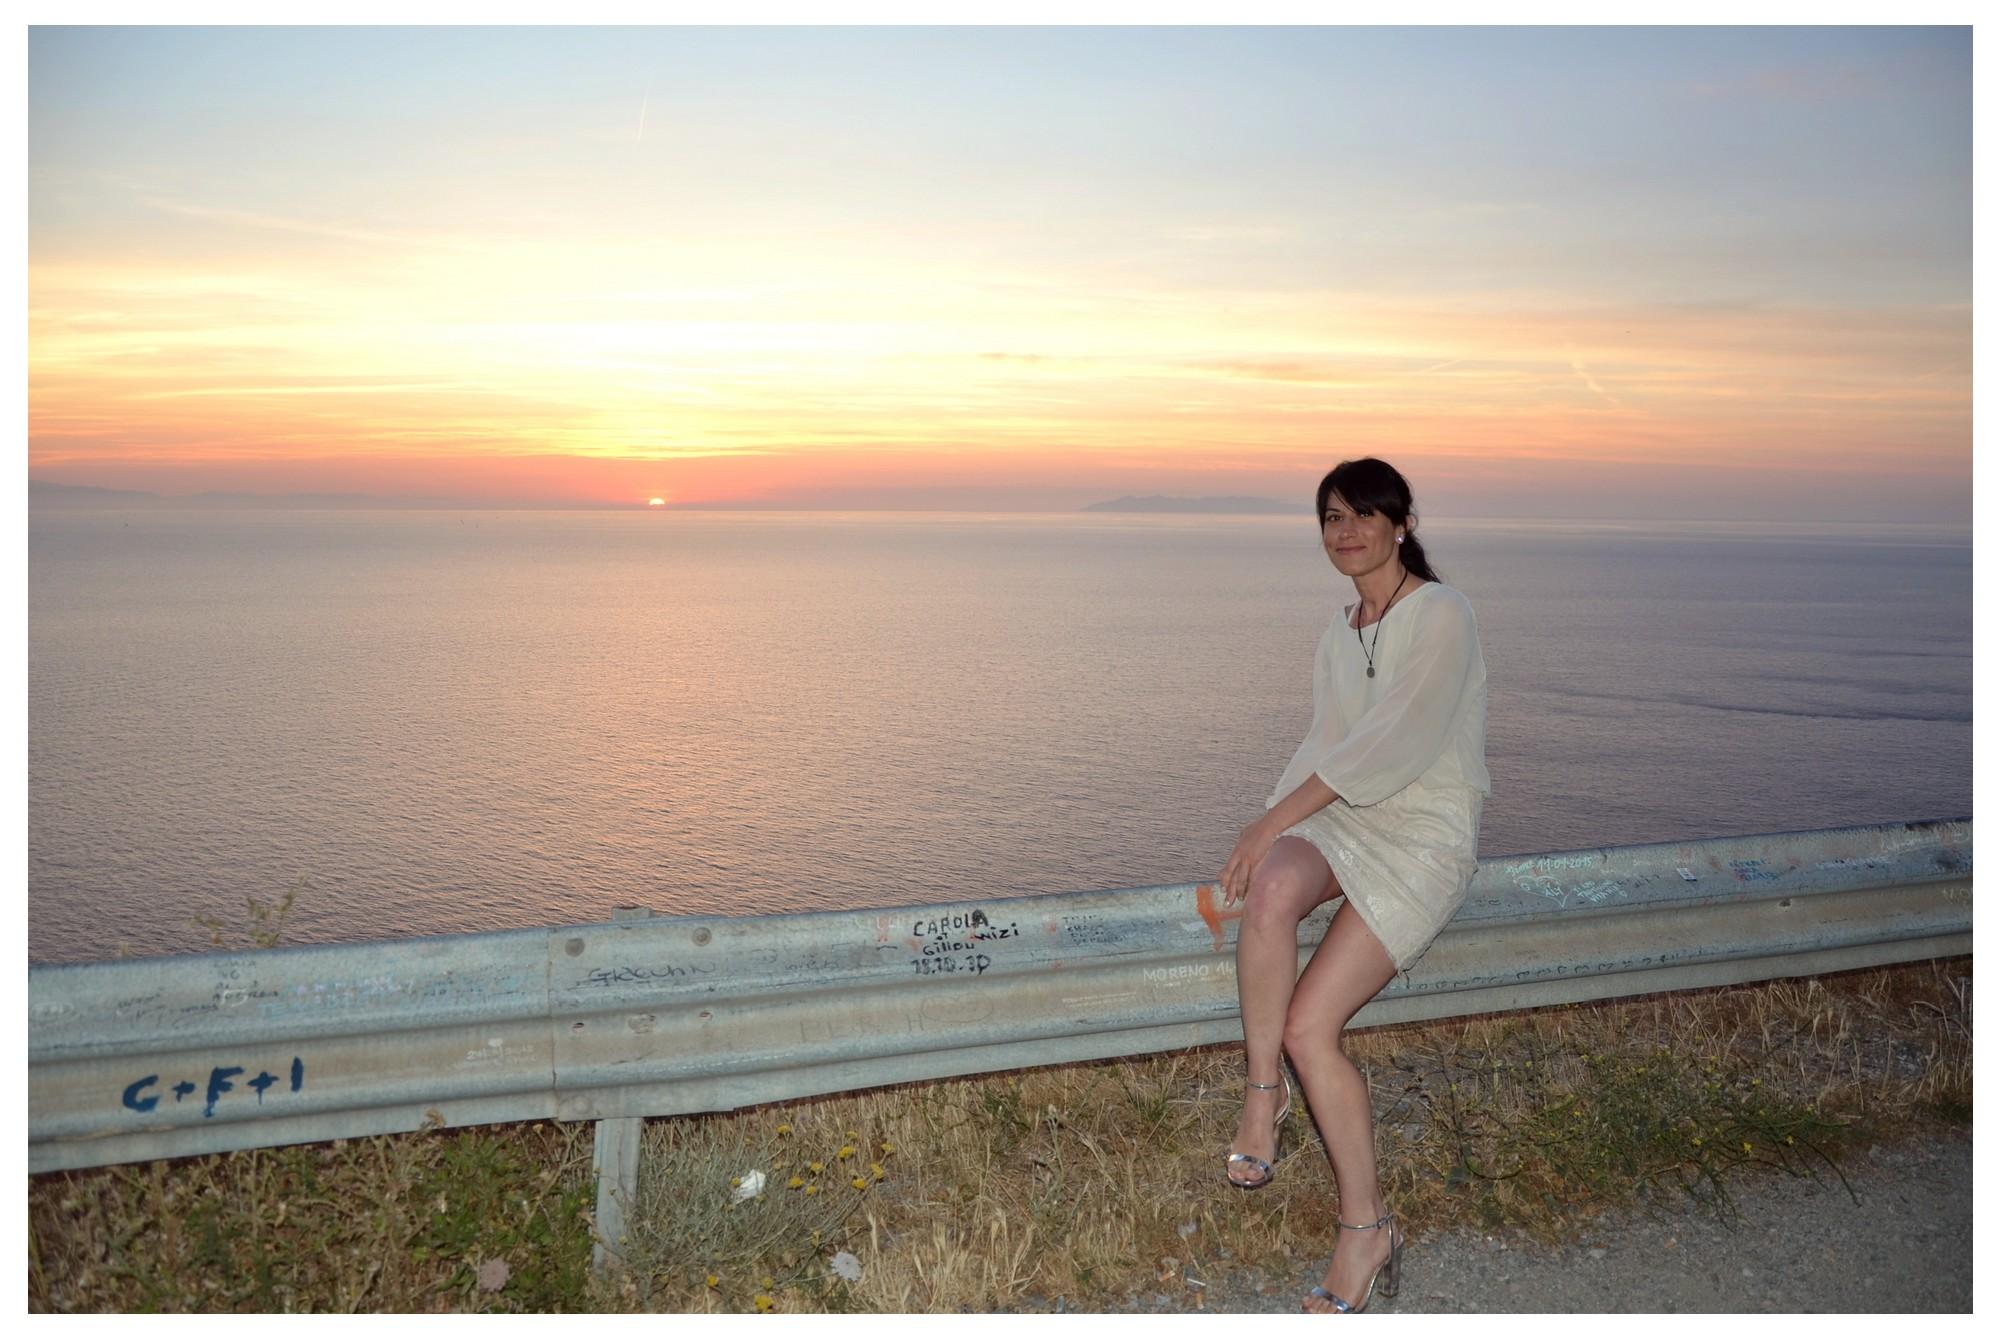 Lovely sunset at Punta Nera